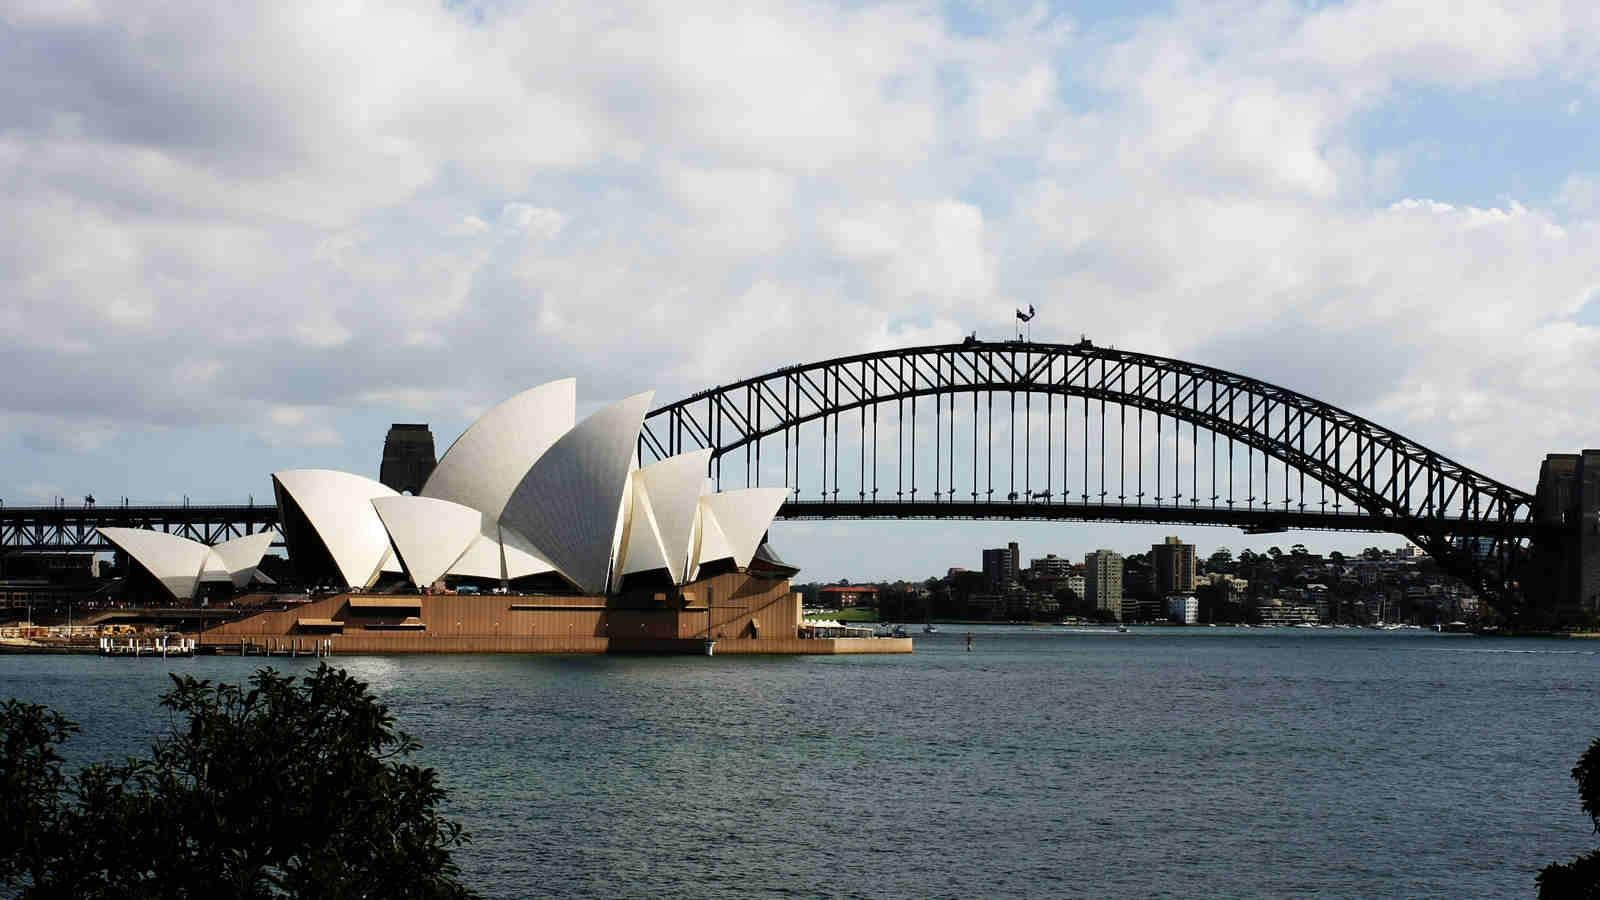 Climate change cooling Australia's economy: RBA governor